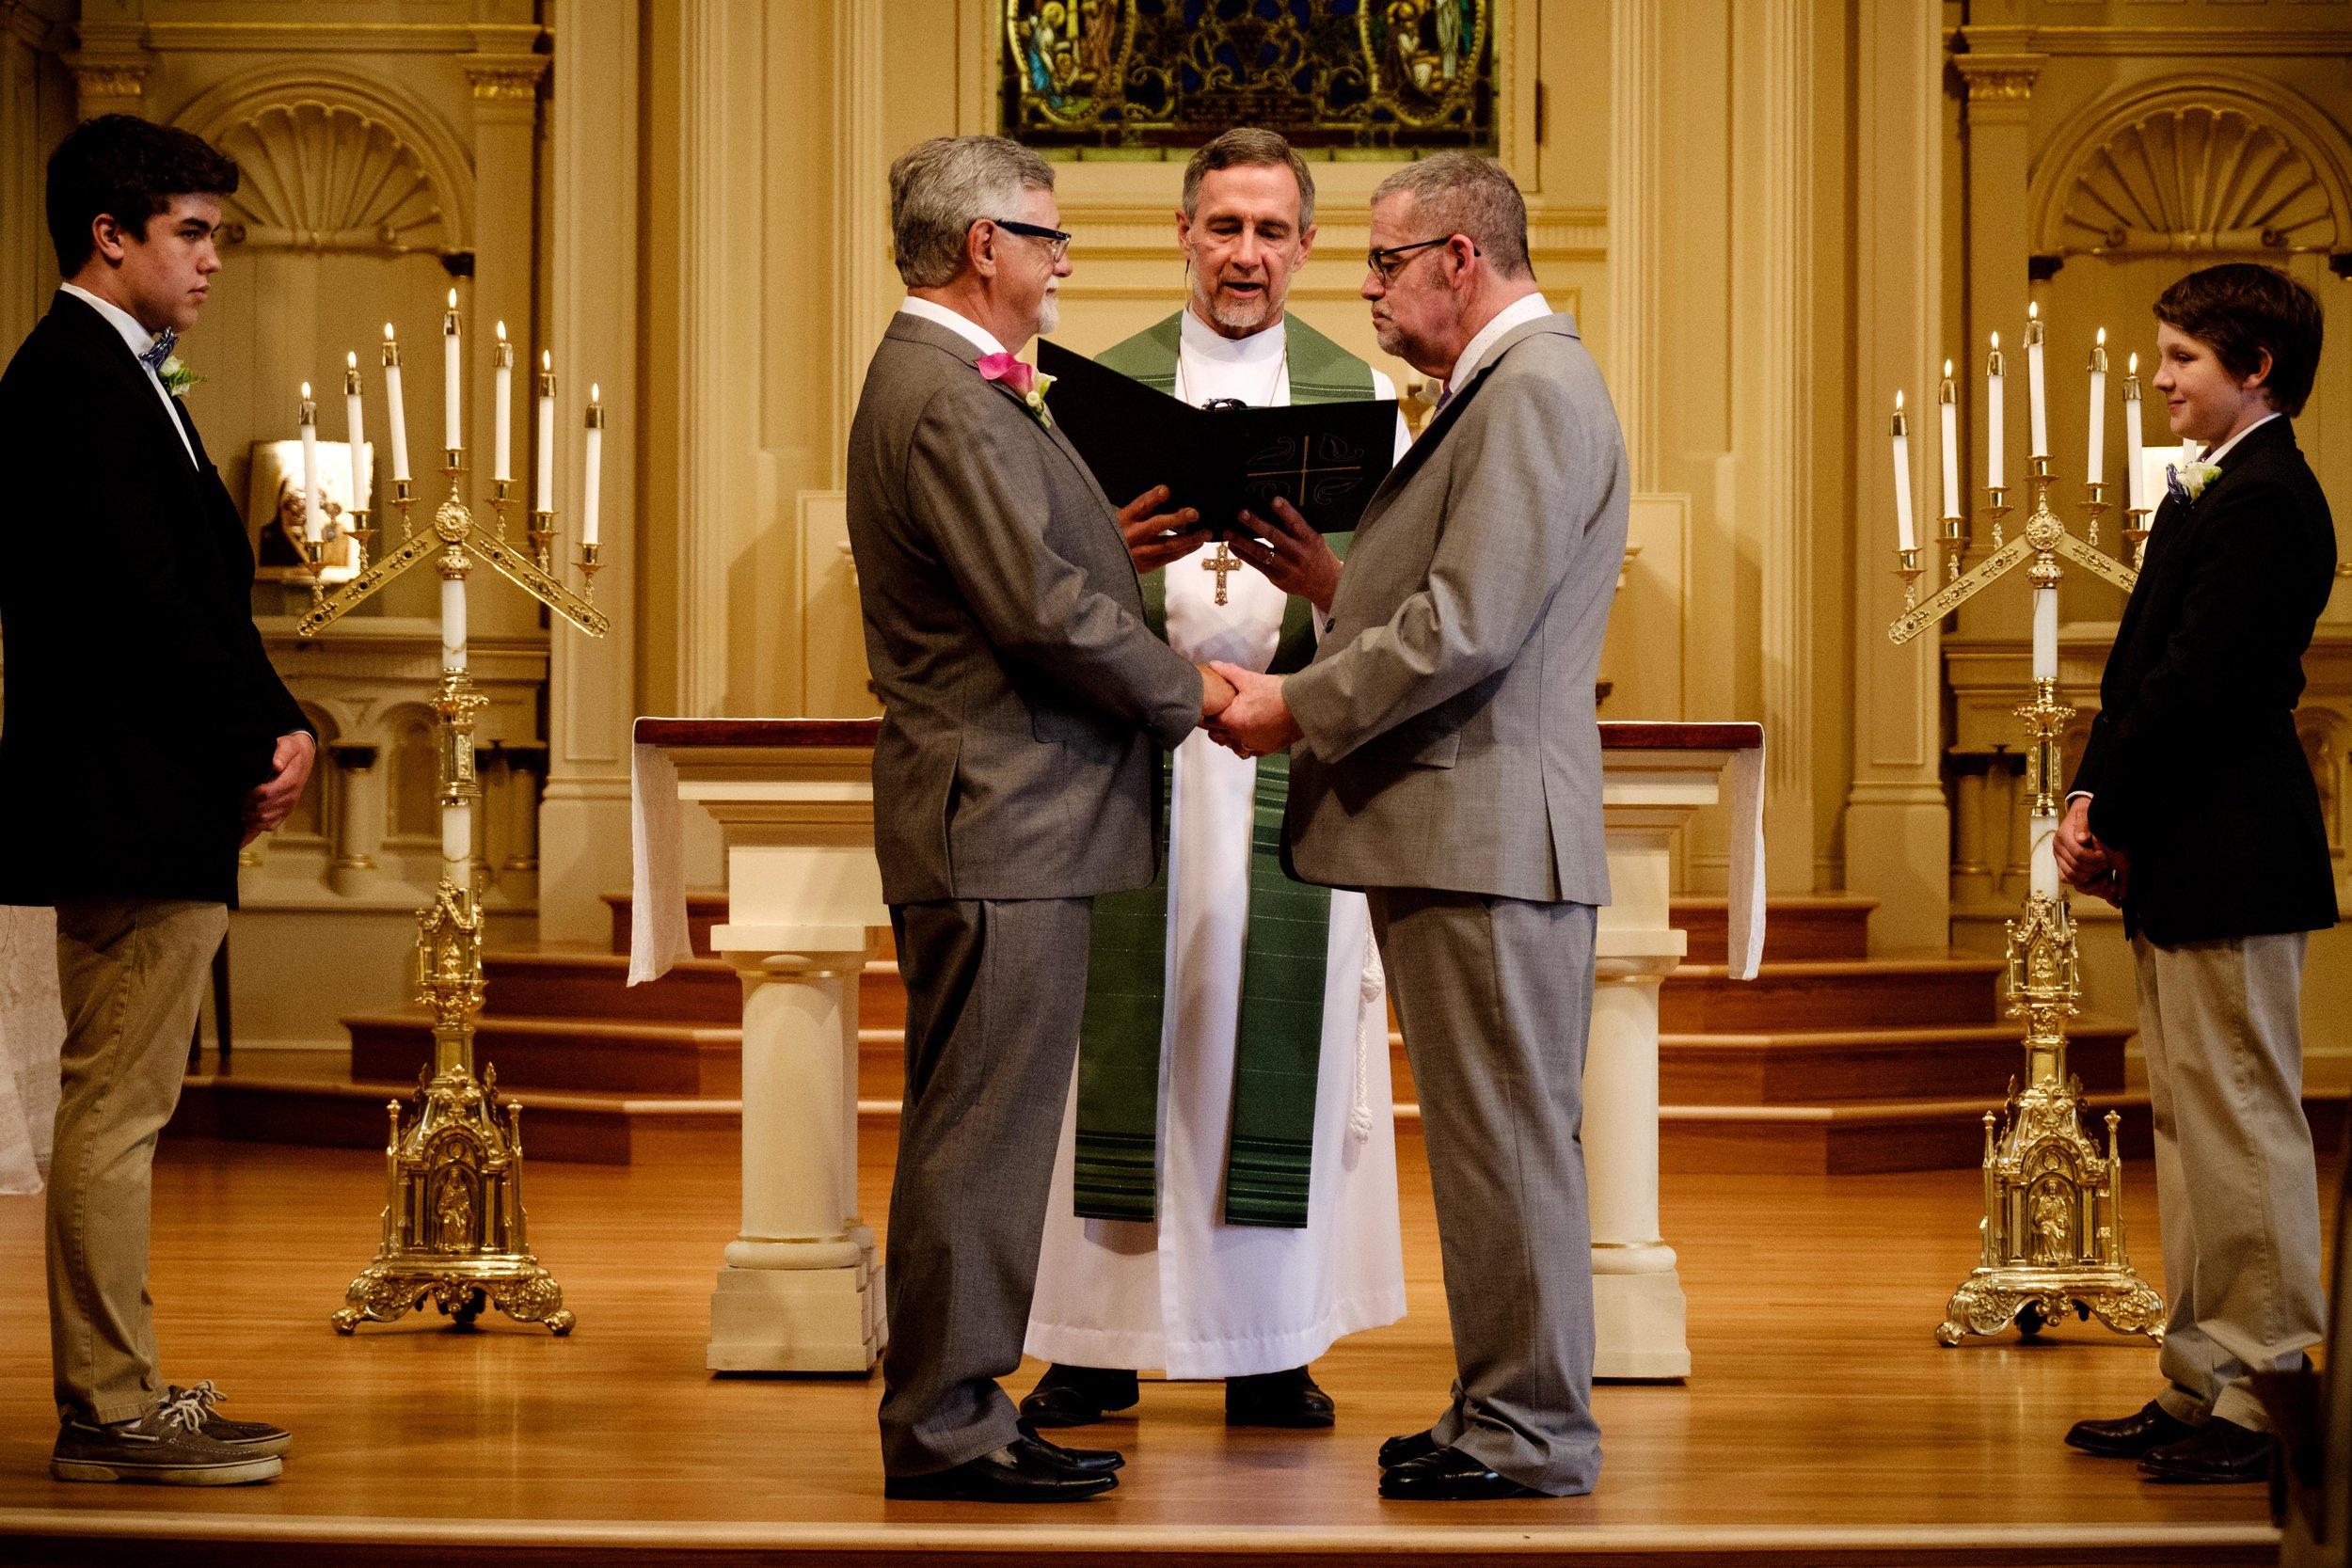 20170715_Clark Daly Wedding-343.jpg